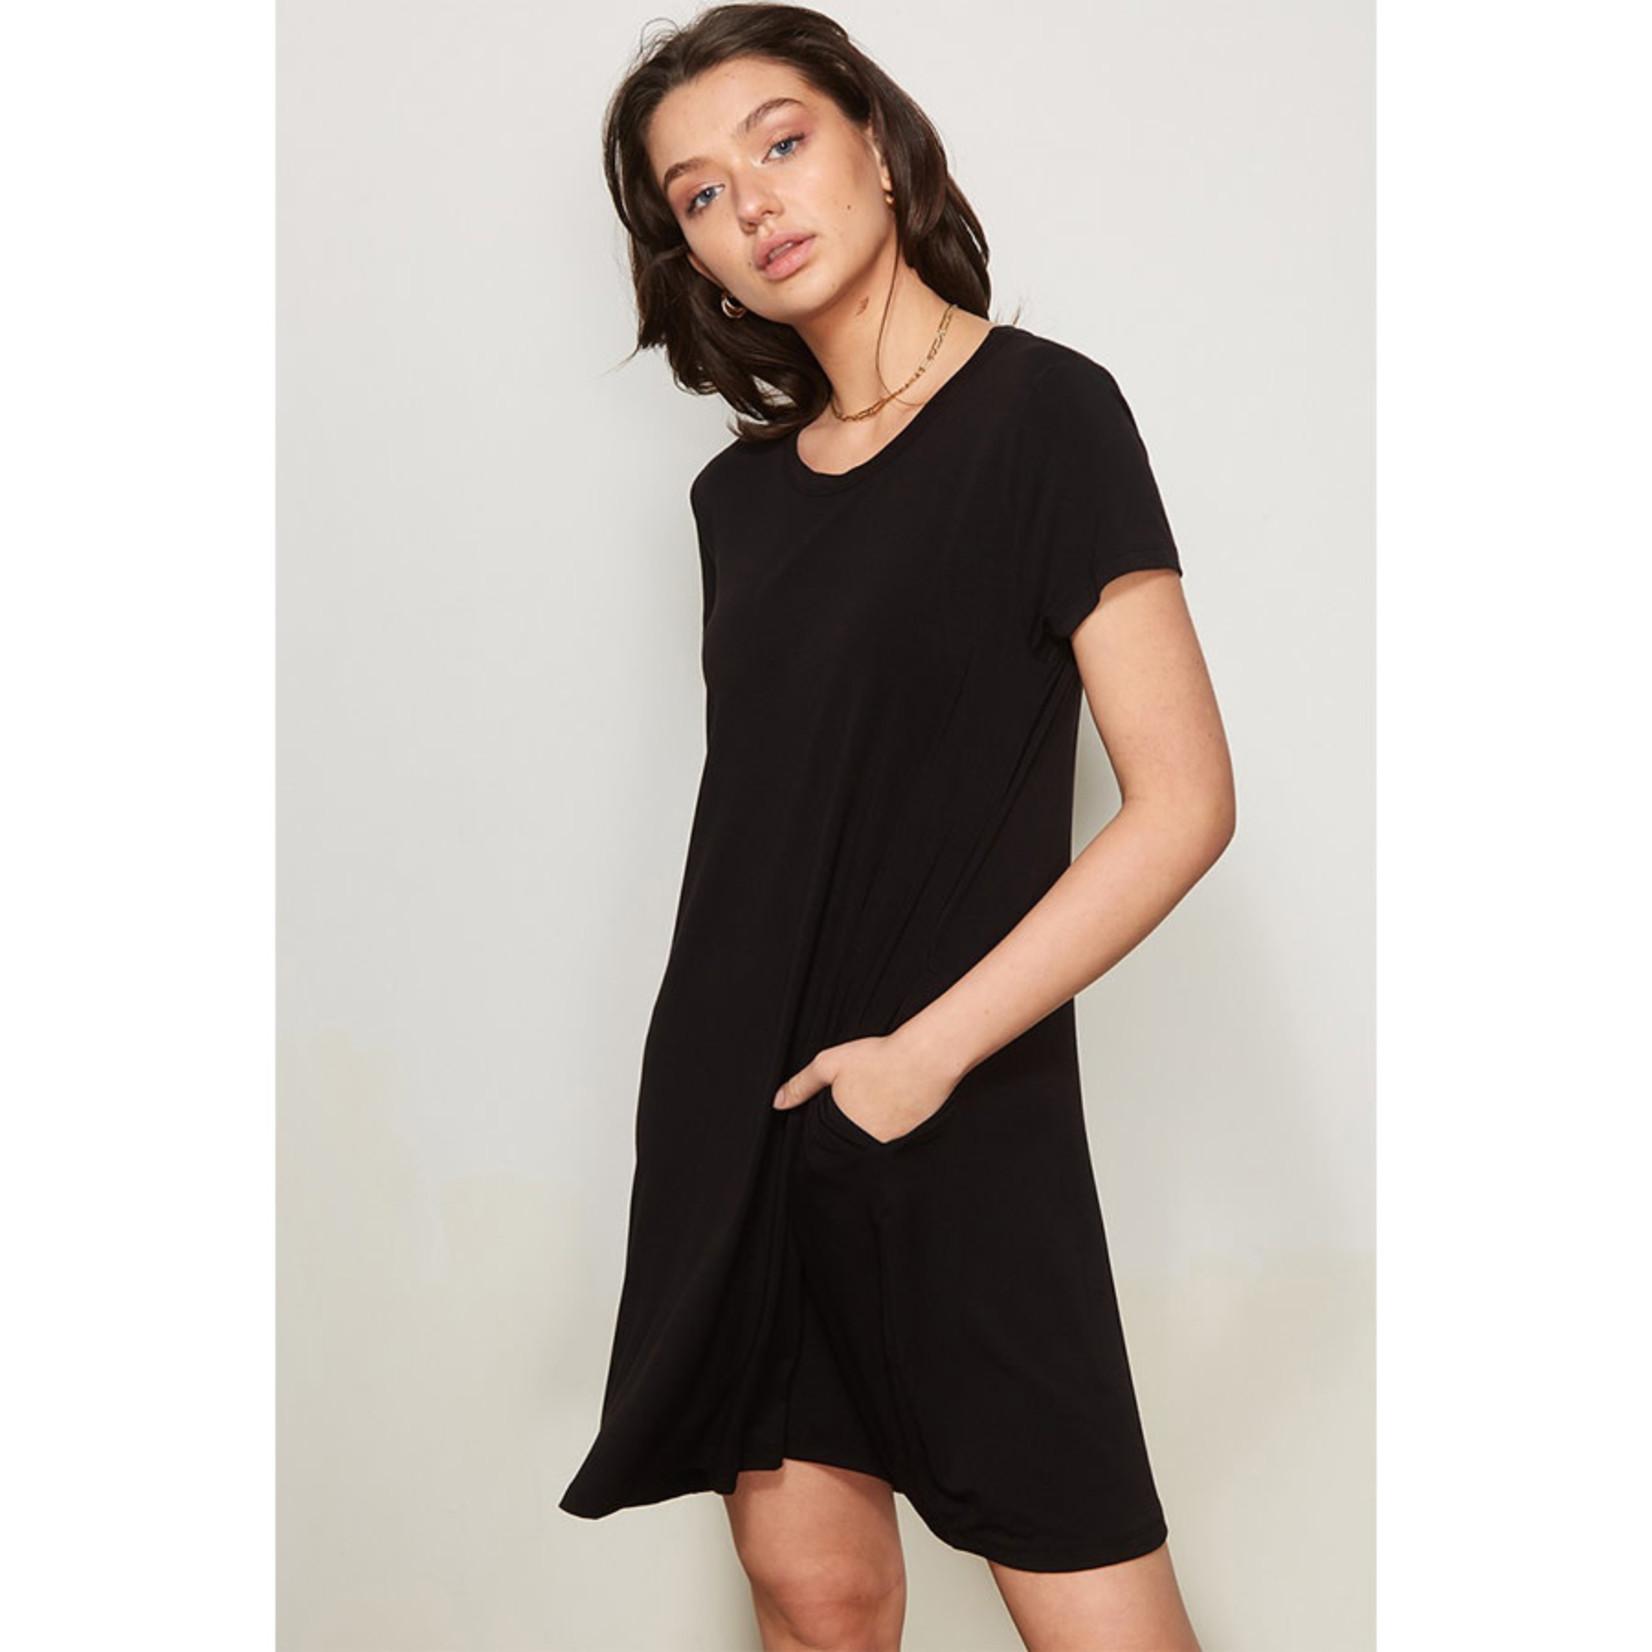 Mittoshop Bamboo Tee Dress